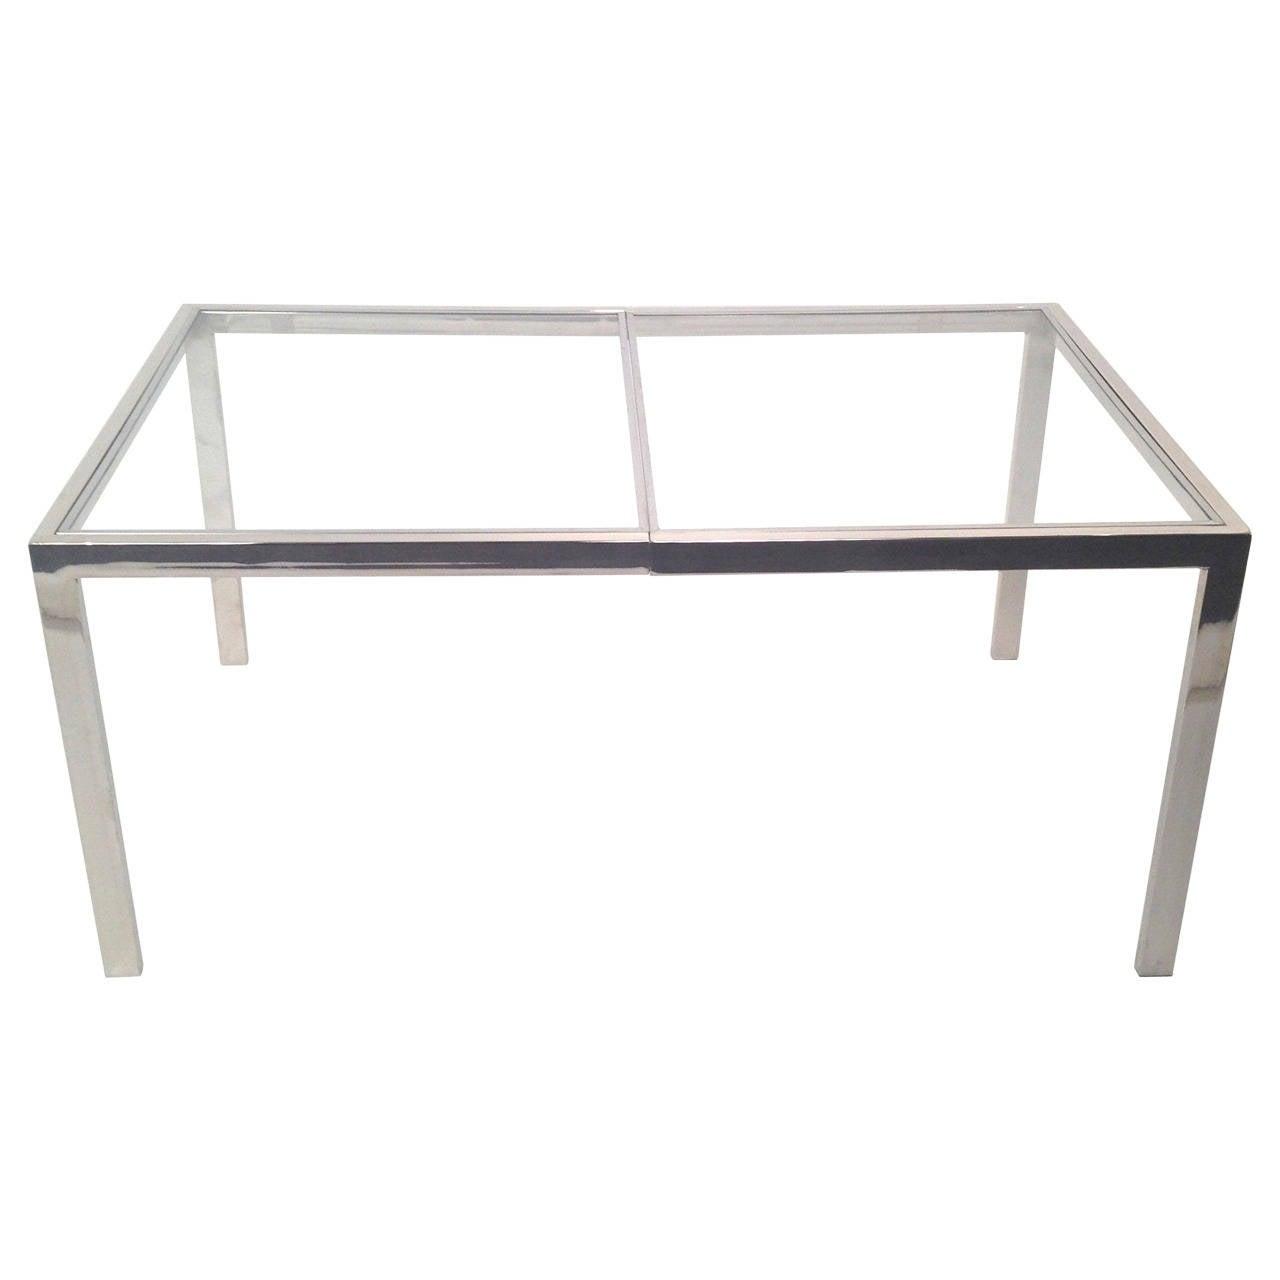 Milo baughman chrome and glass dining table for Glass and chrome dining table